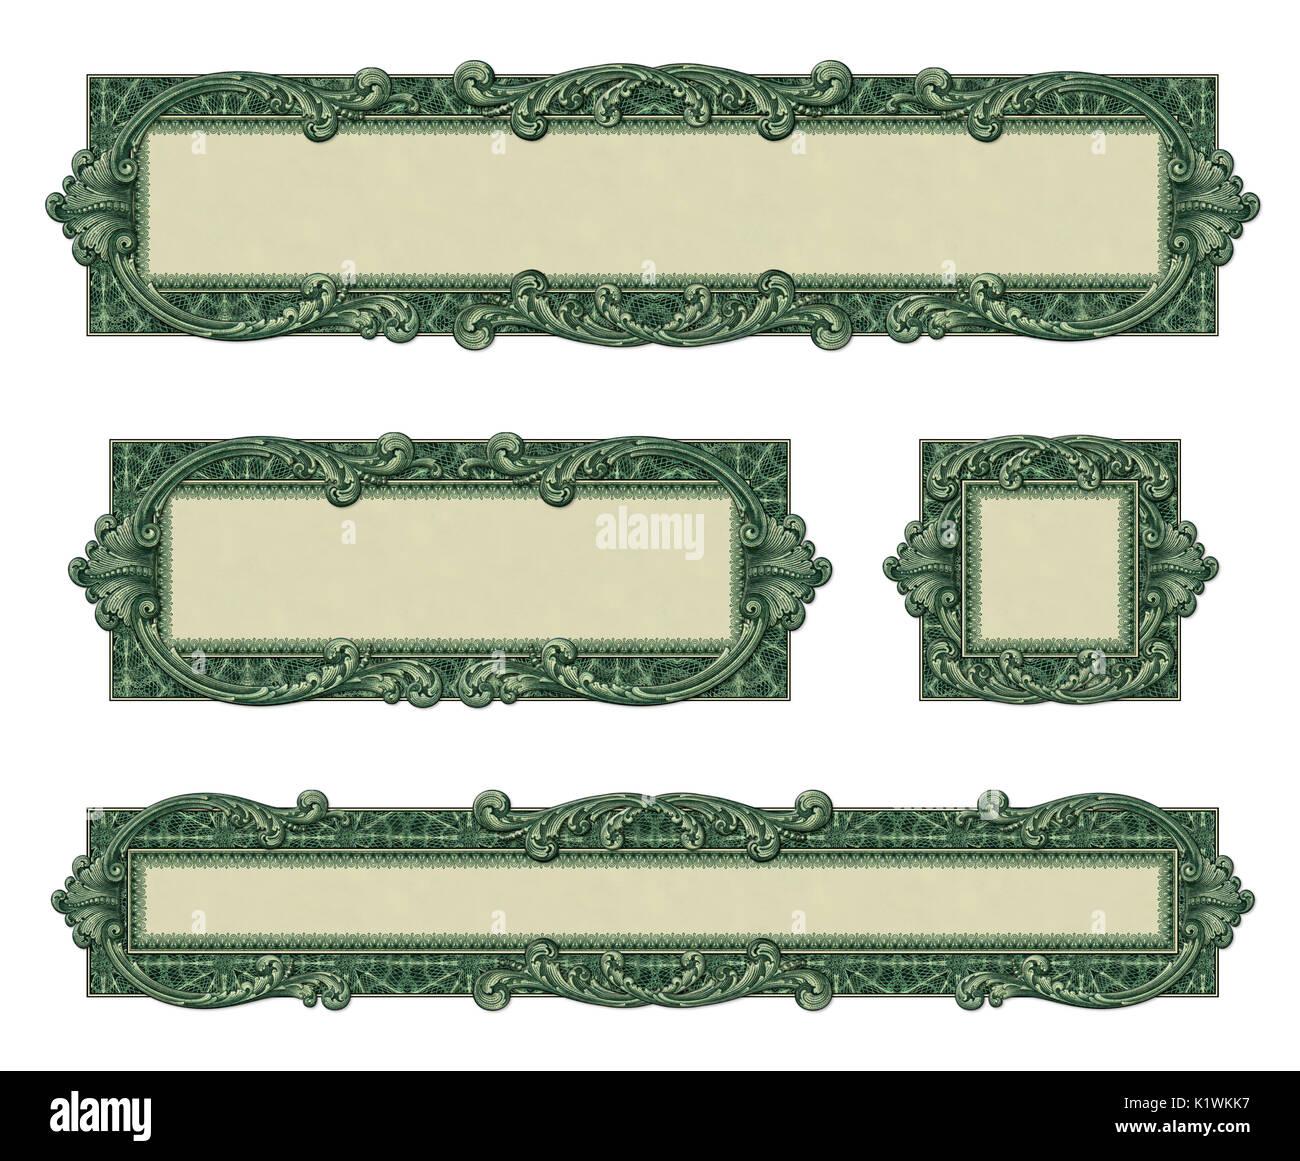 photo illustration of 4 bordersframes using elements from a dollar bill - Dollar Frames